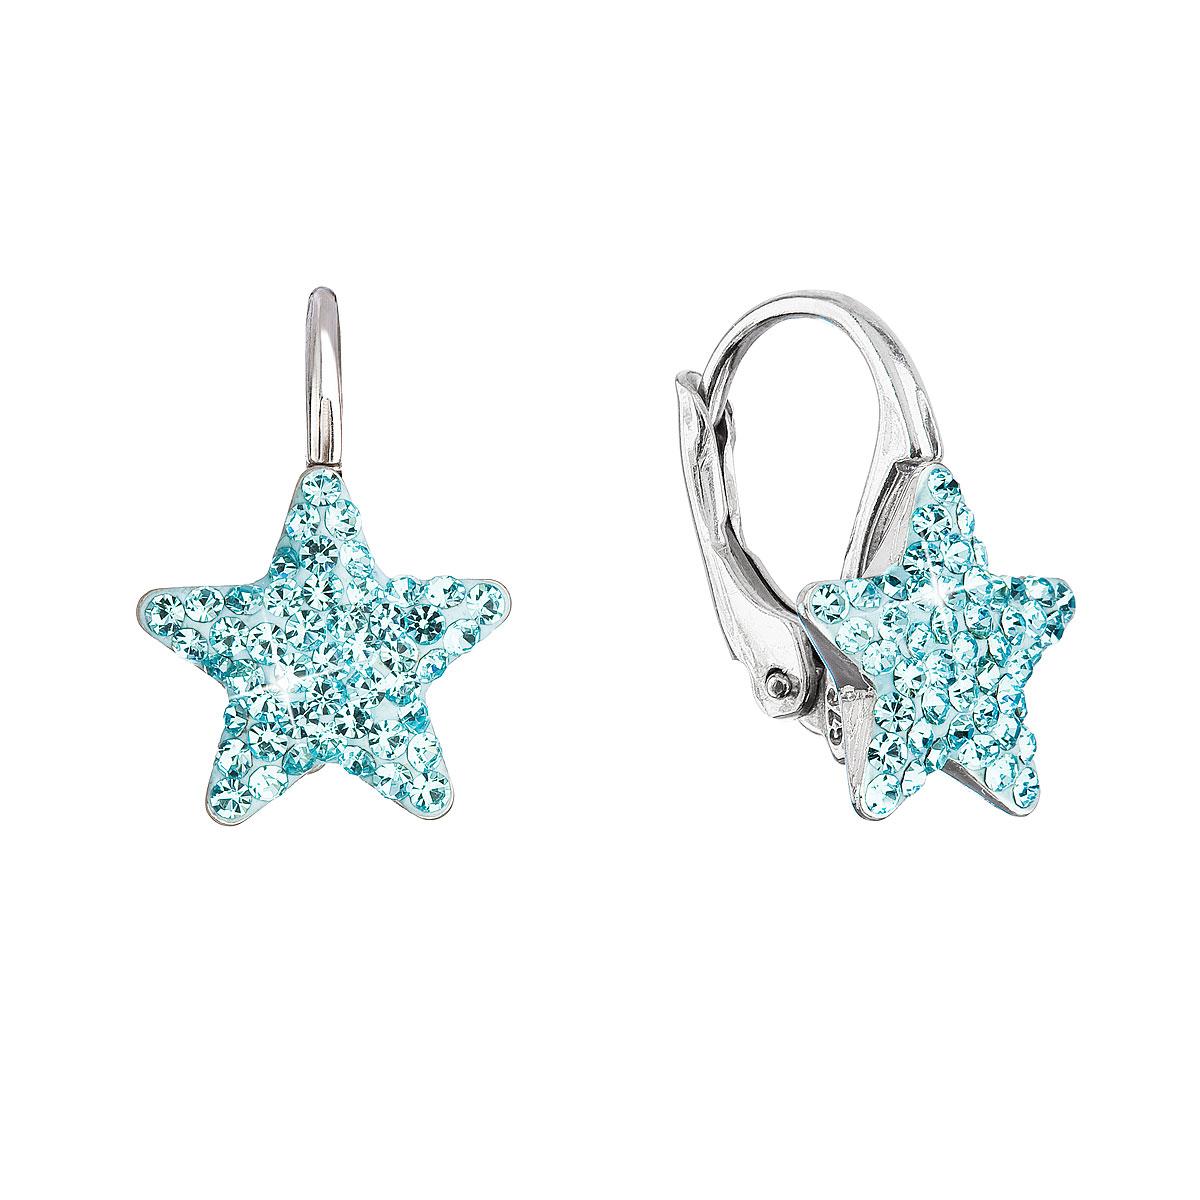 Evolution Group Stříbrné náušnice visací s Preciosa krystaly modré hvězdičky 31311.3 aqua